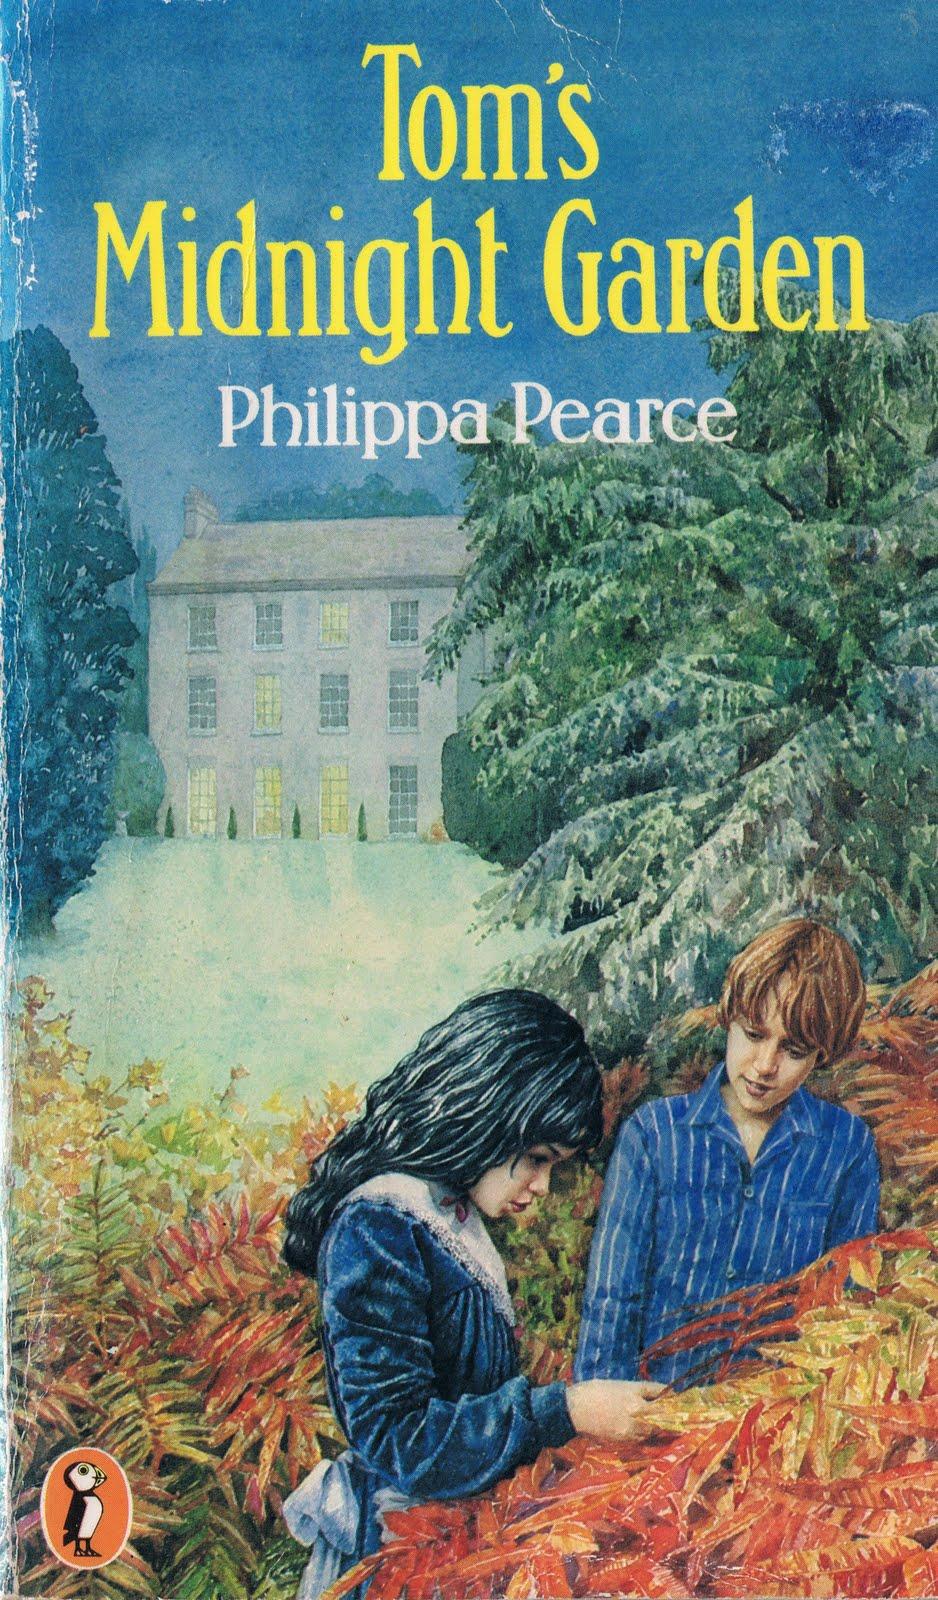 toms midnight garden by philippa pearce essay